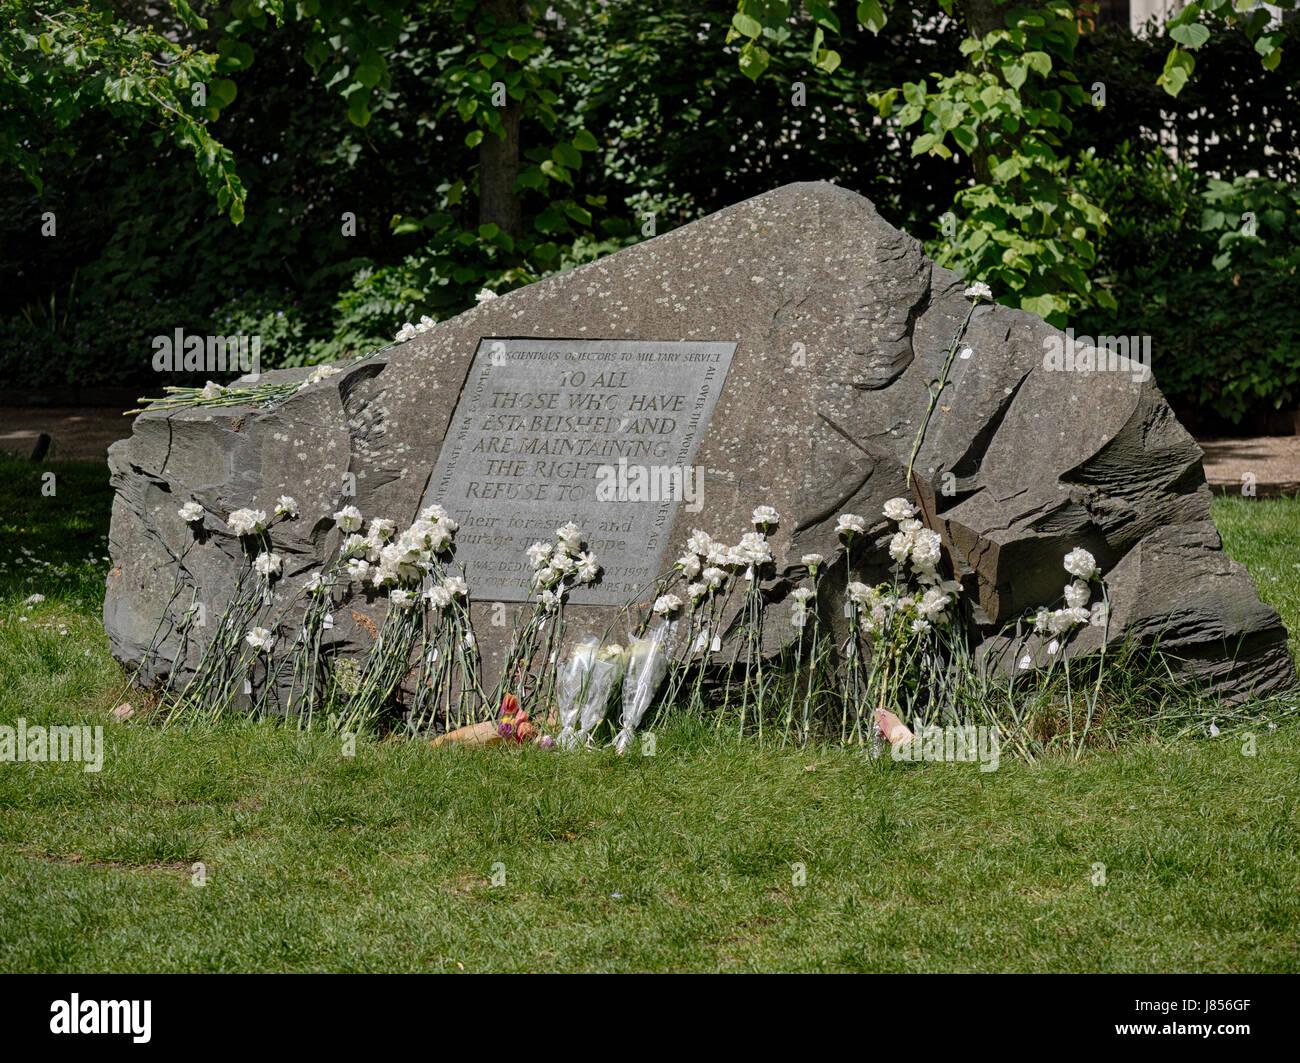 Conscientious Objectors Memorial Stone, Tavistock Square, London Stock Photo